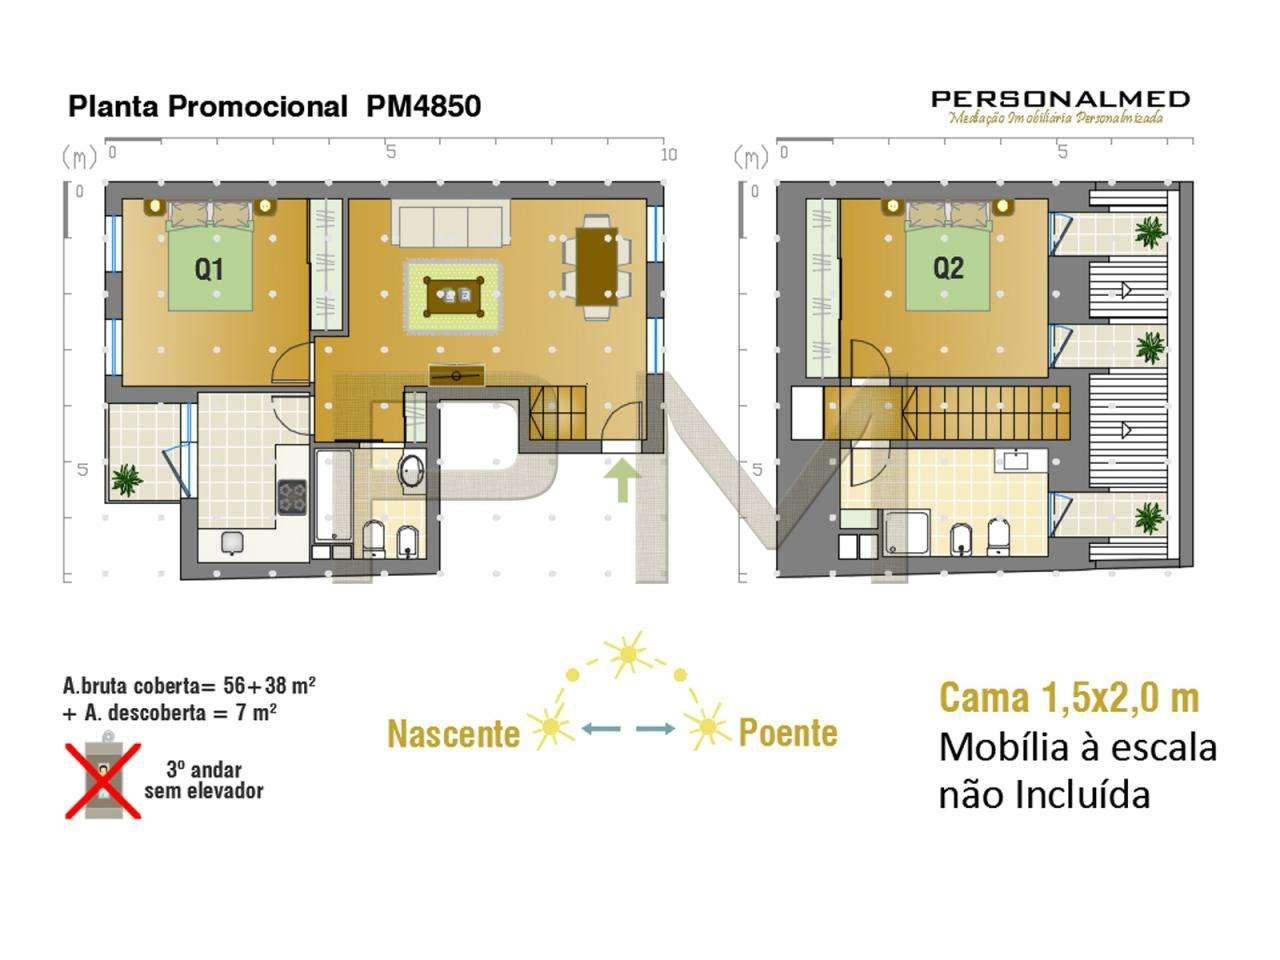 Apartamento para comprar, Areeiro, Lisboa - Foto 3